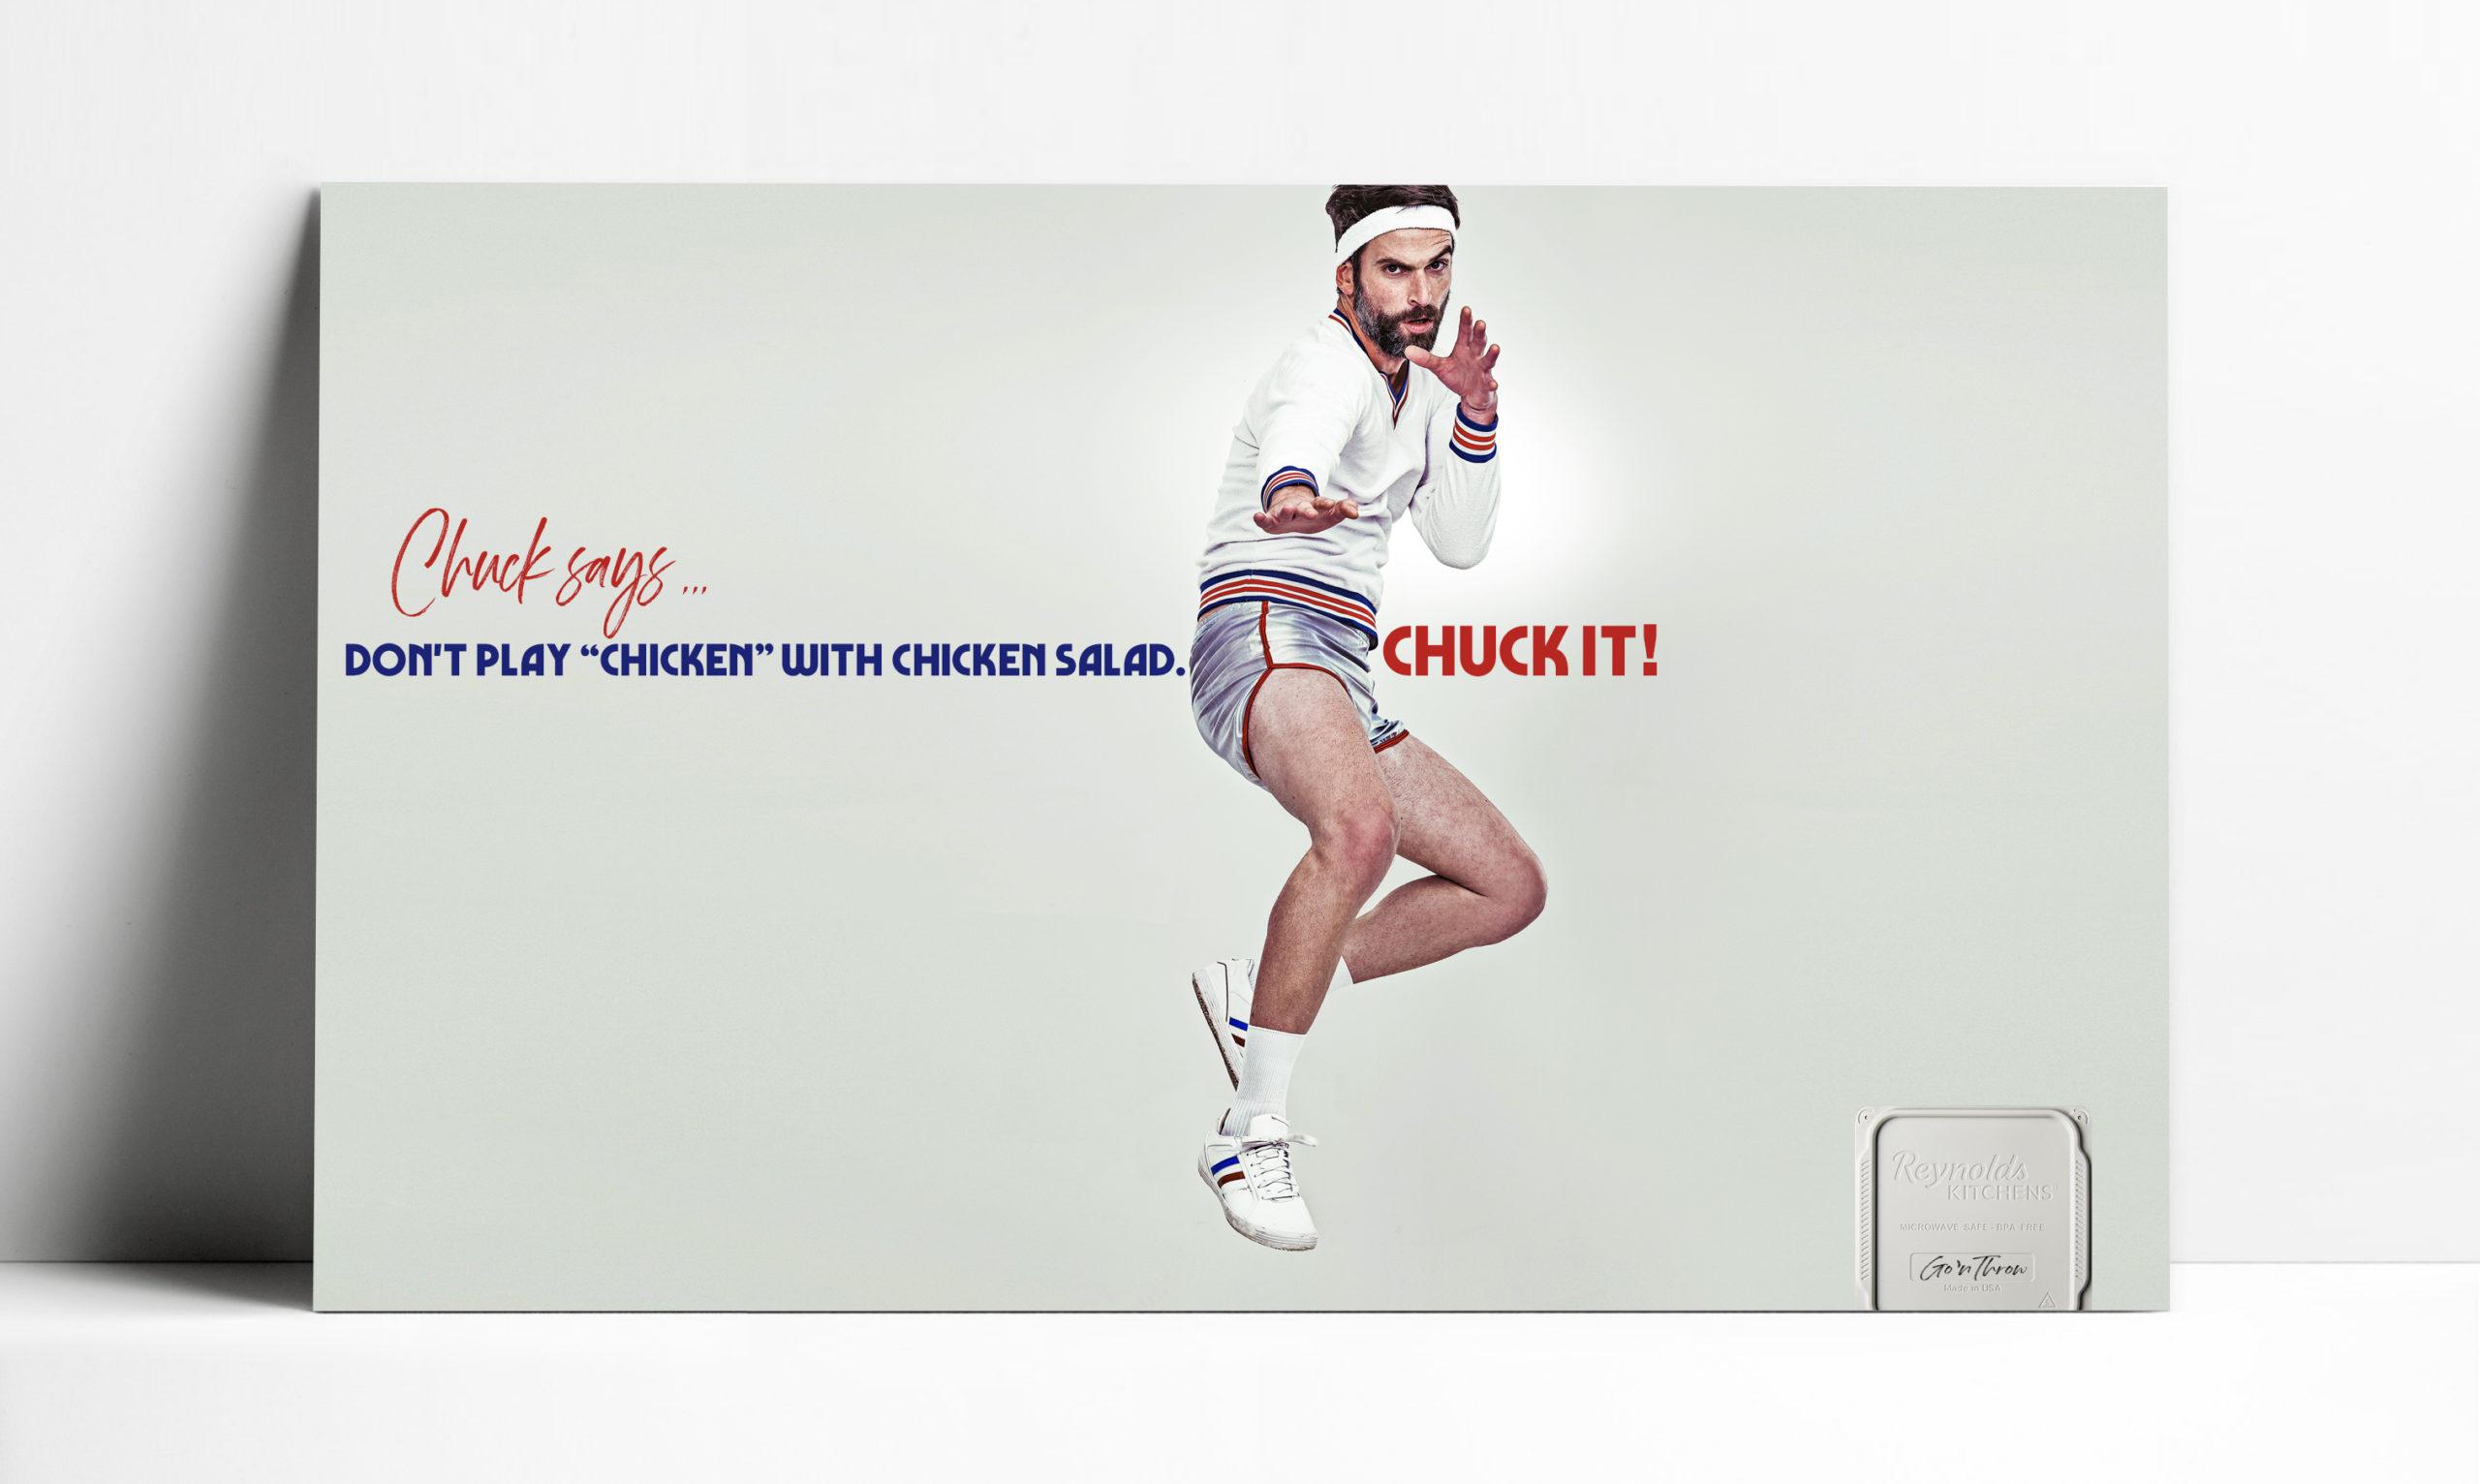 REYNOLDS_PresoAd_ChuckIt1